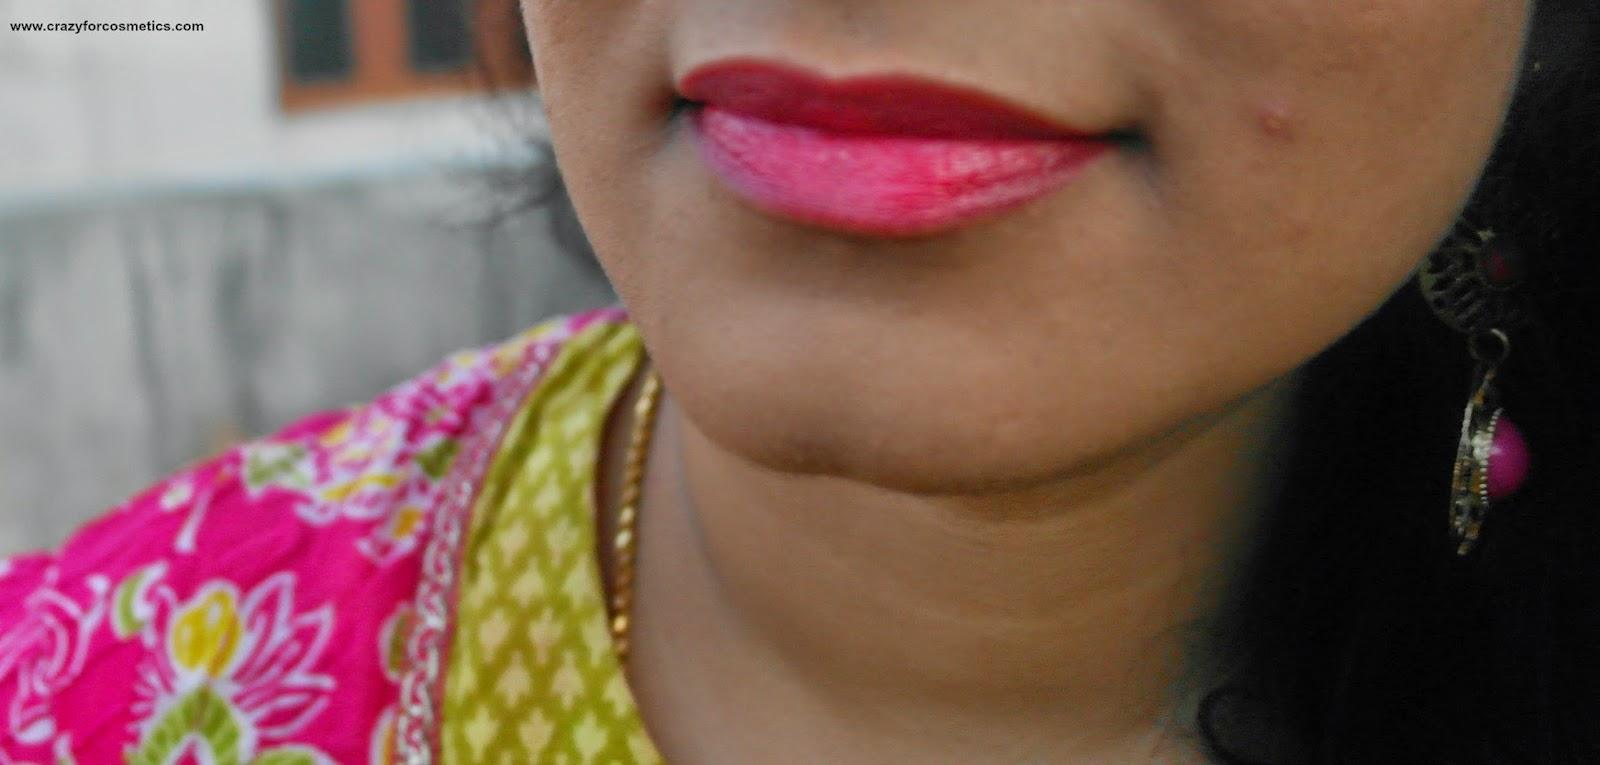 Bourjois Paris Color Boost Lip Crayon in Red Sunrise lip swatches